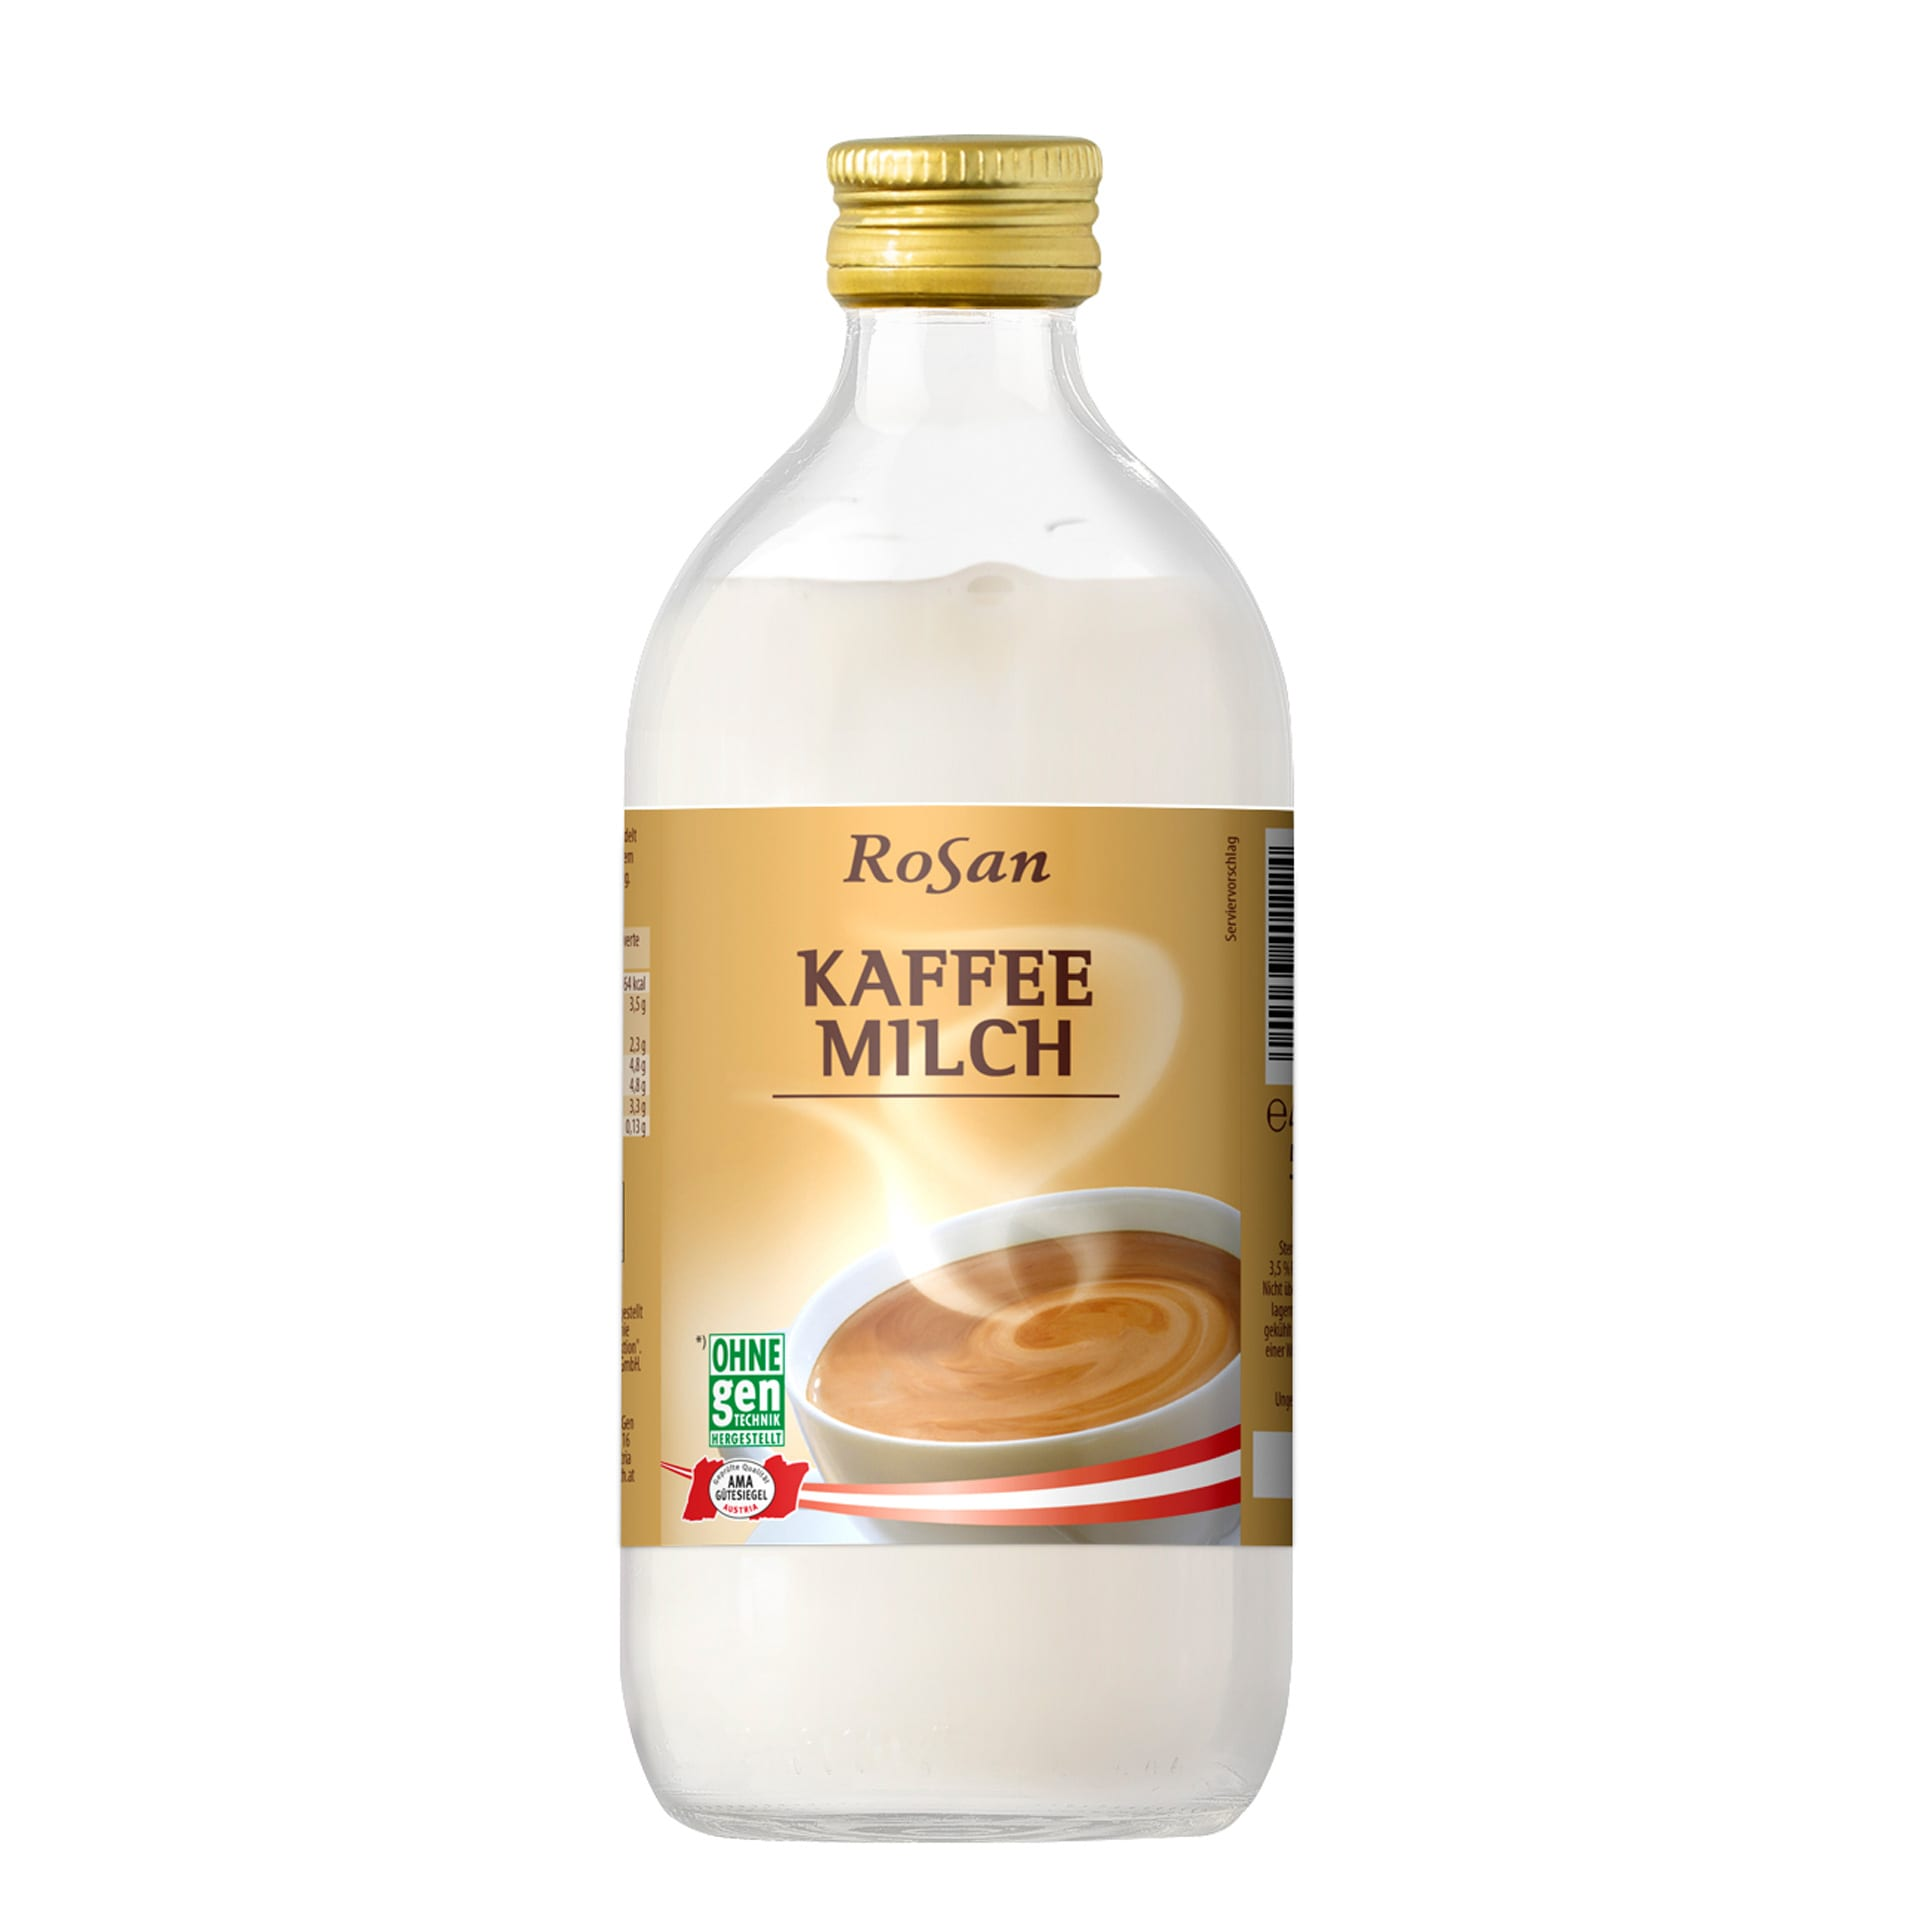 Rosan Kaffeemilch 3,5 %